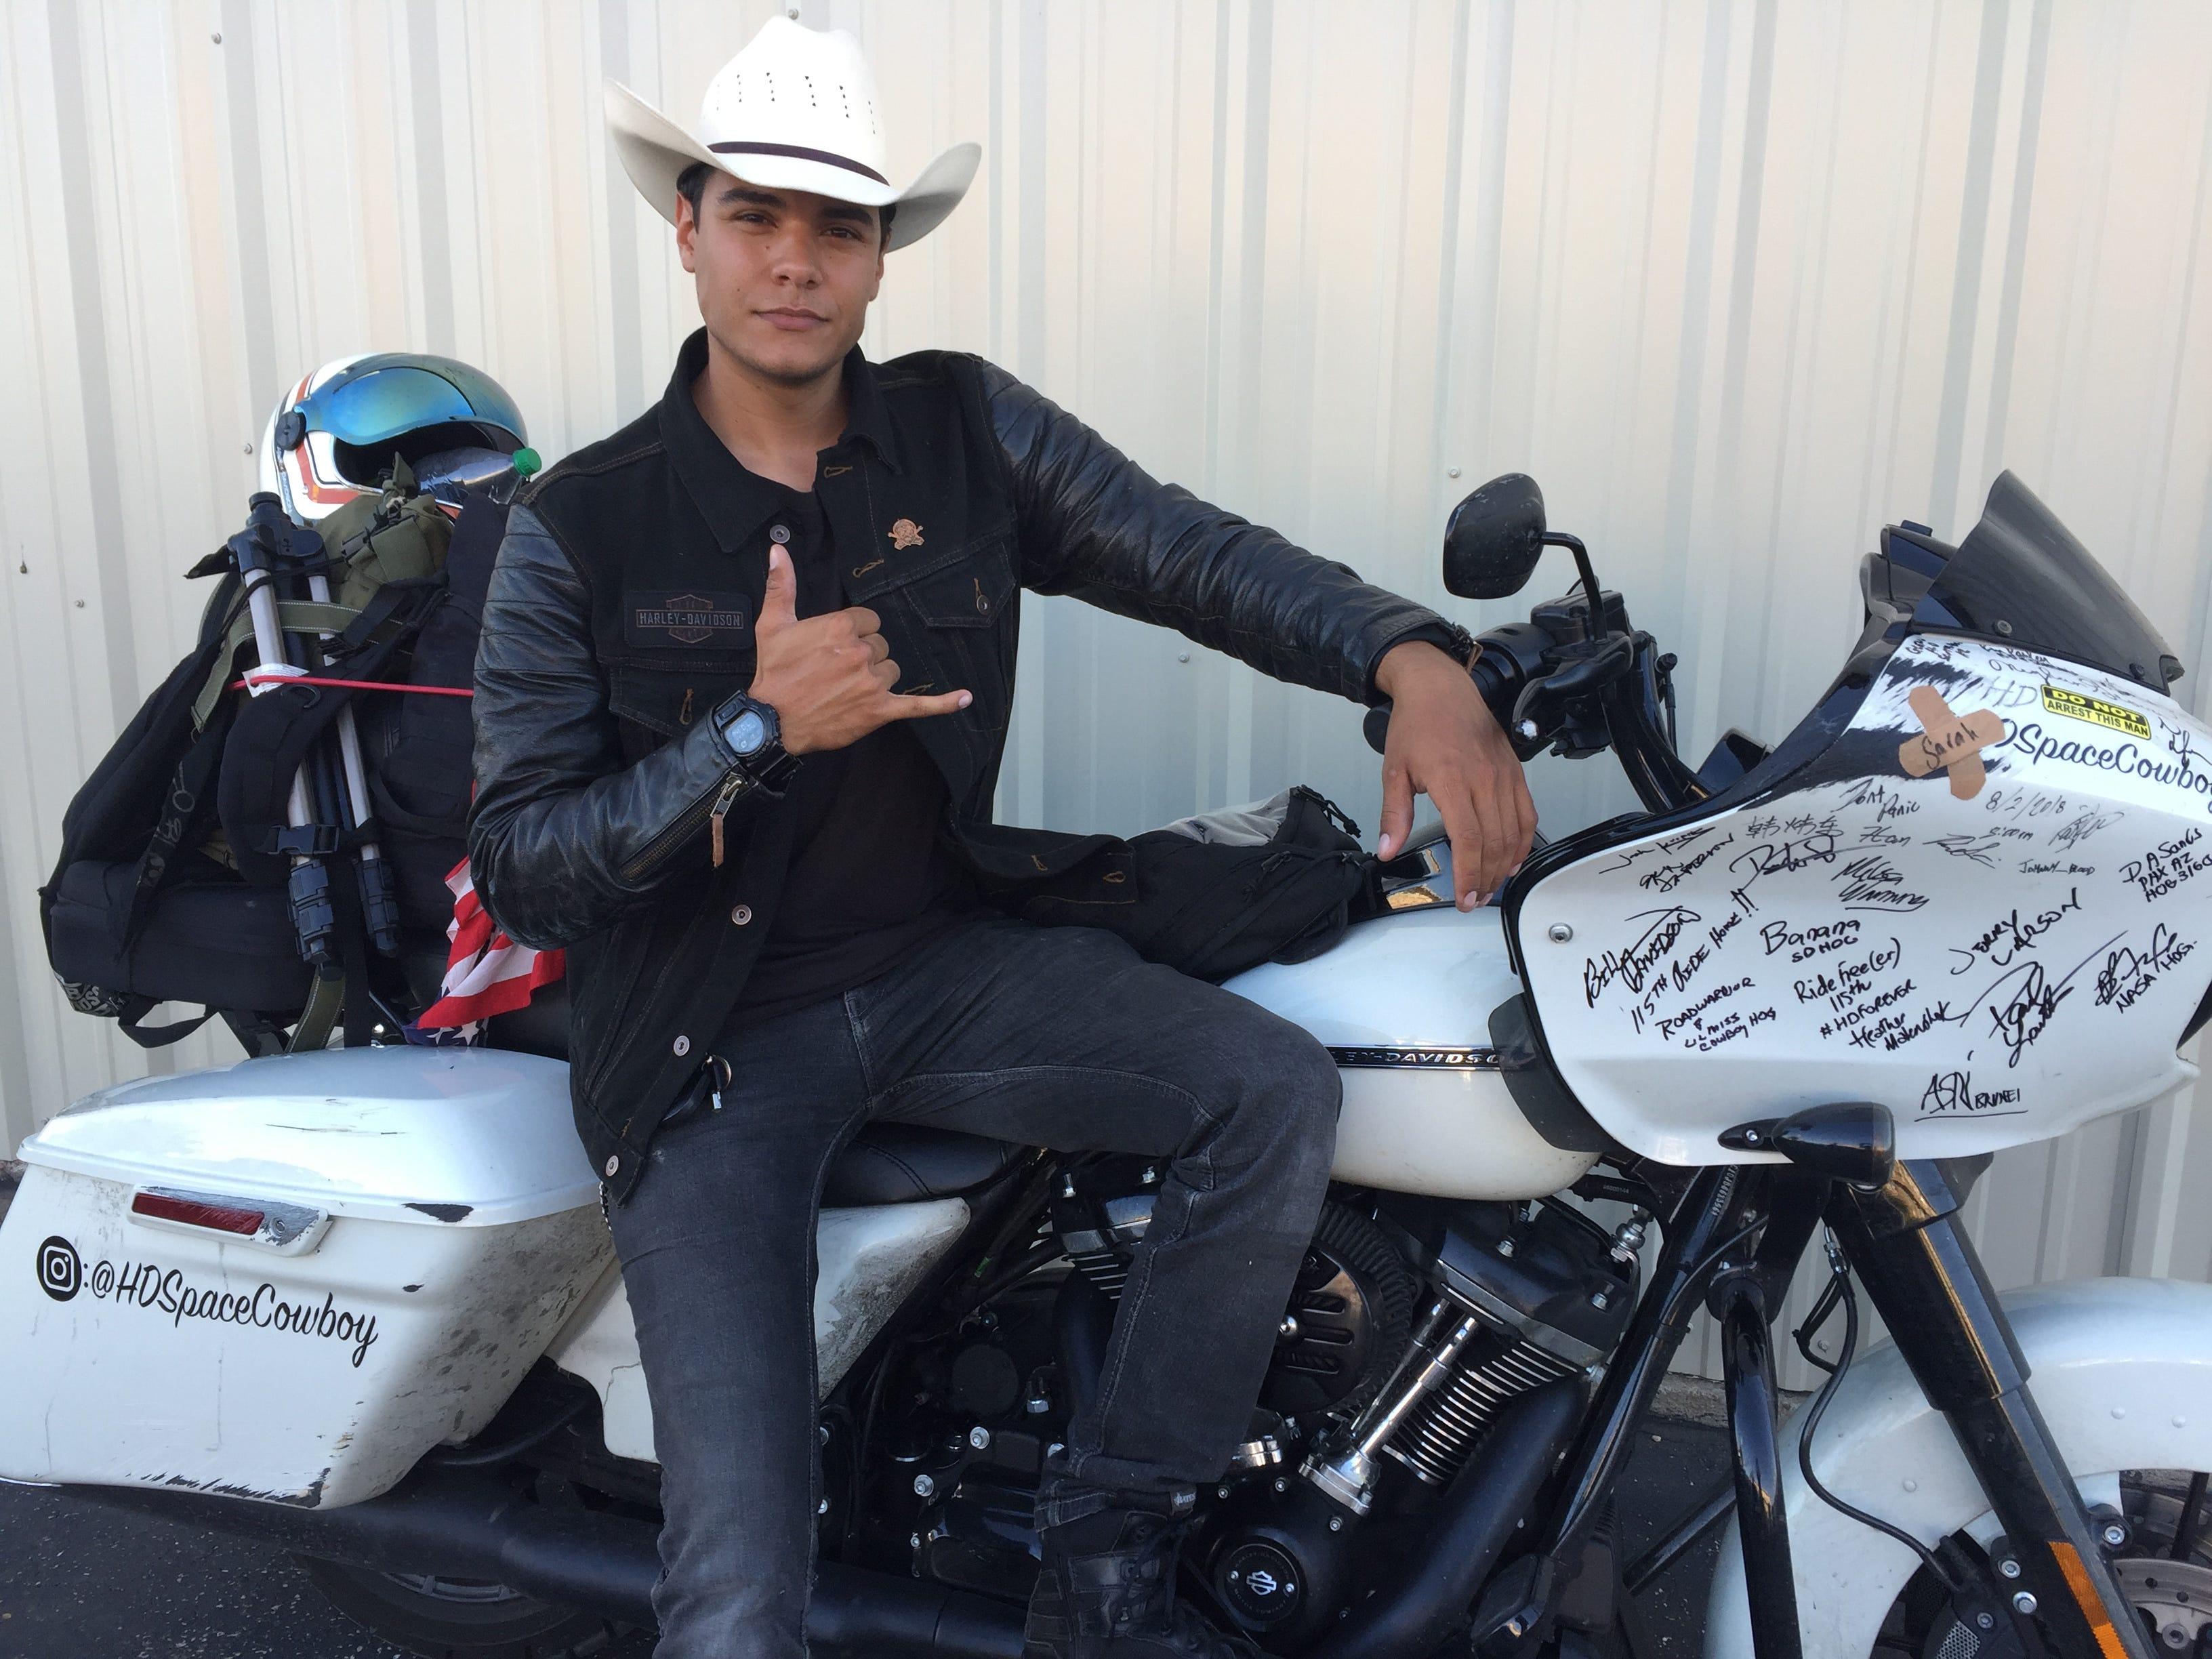 Harley Davidson Intern Overcame Pain